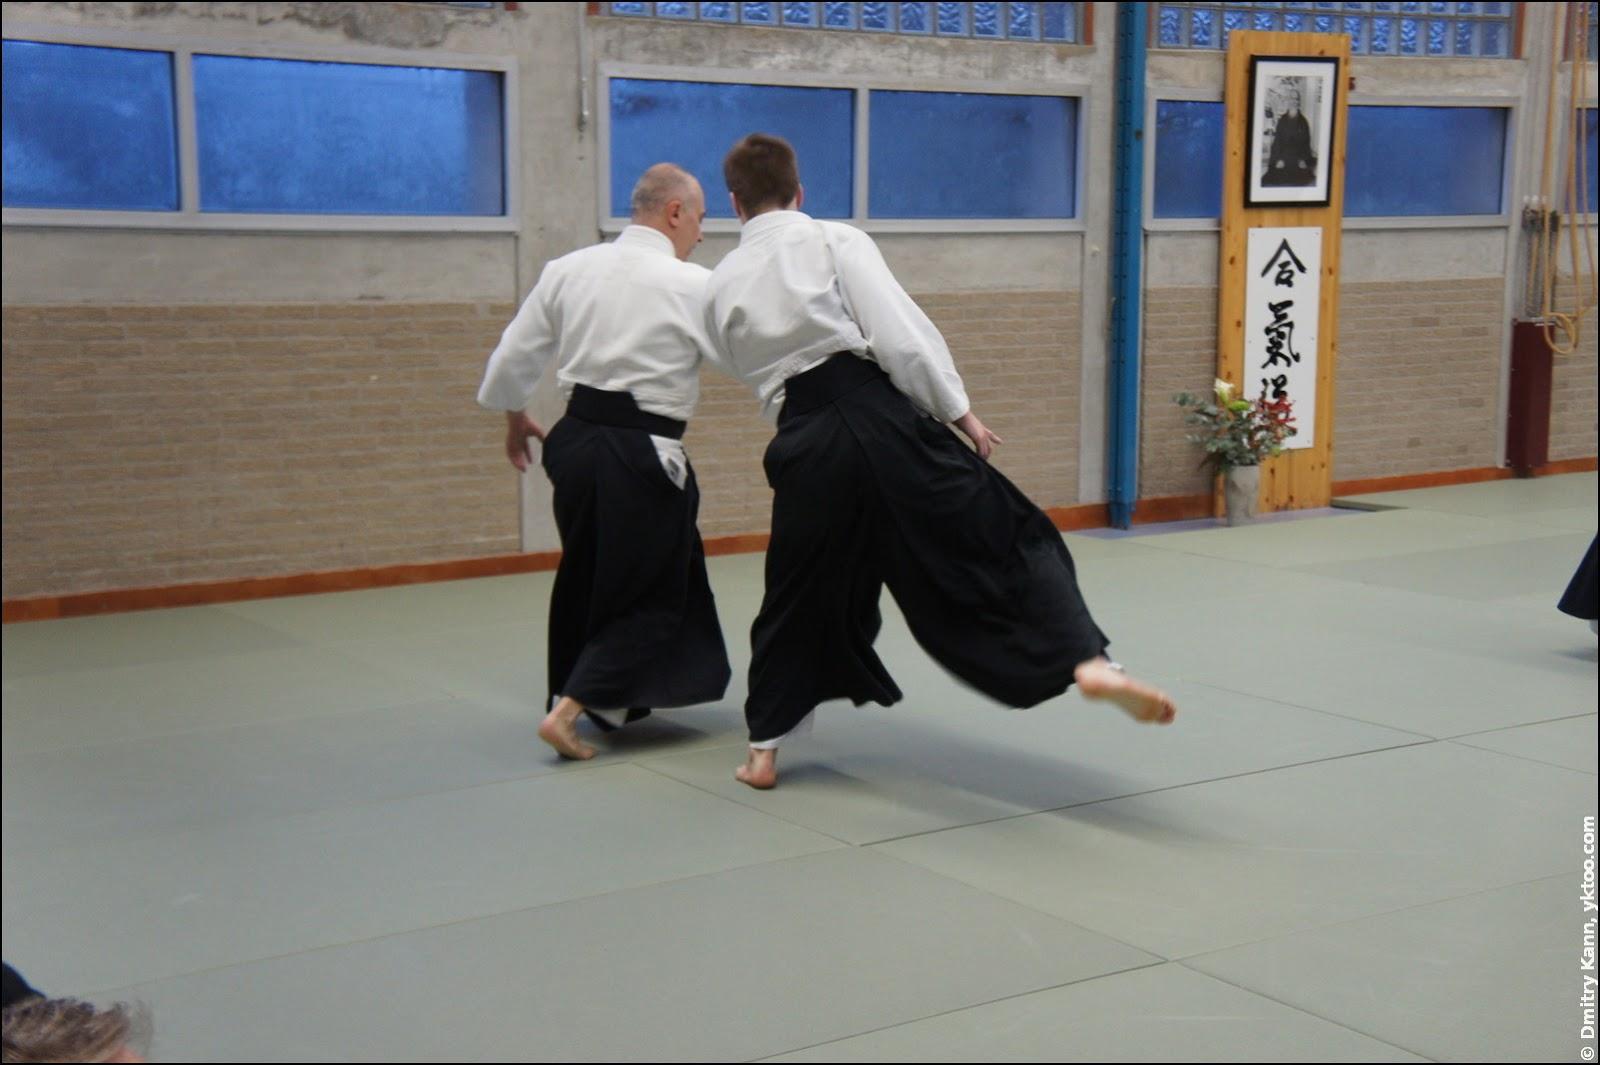 The seminar at Aikido Centrum Leiden.